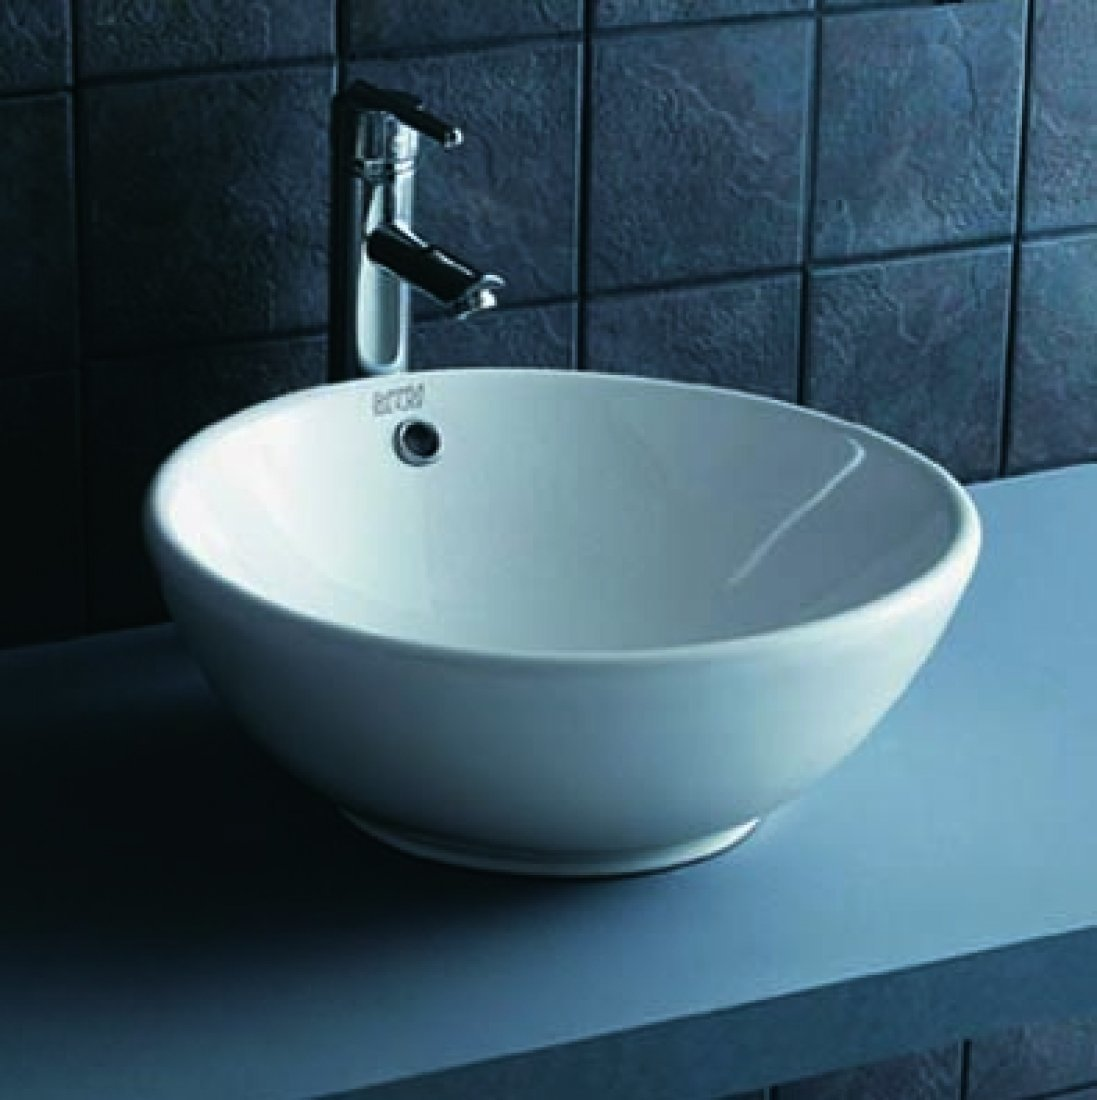 vasque ceramique ou porcelaine Maia- Vasque-Lavabo en porcelaine (17u0027u0027x17u0027u0027x6,